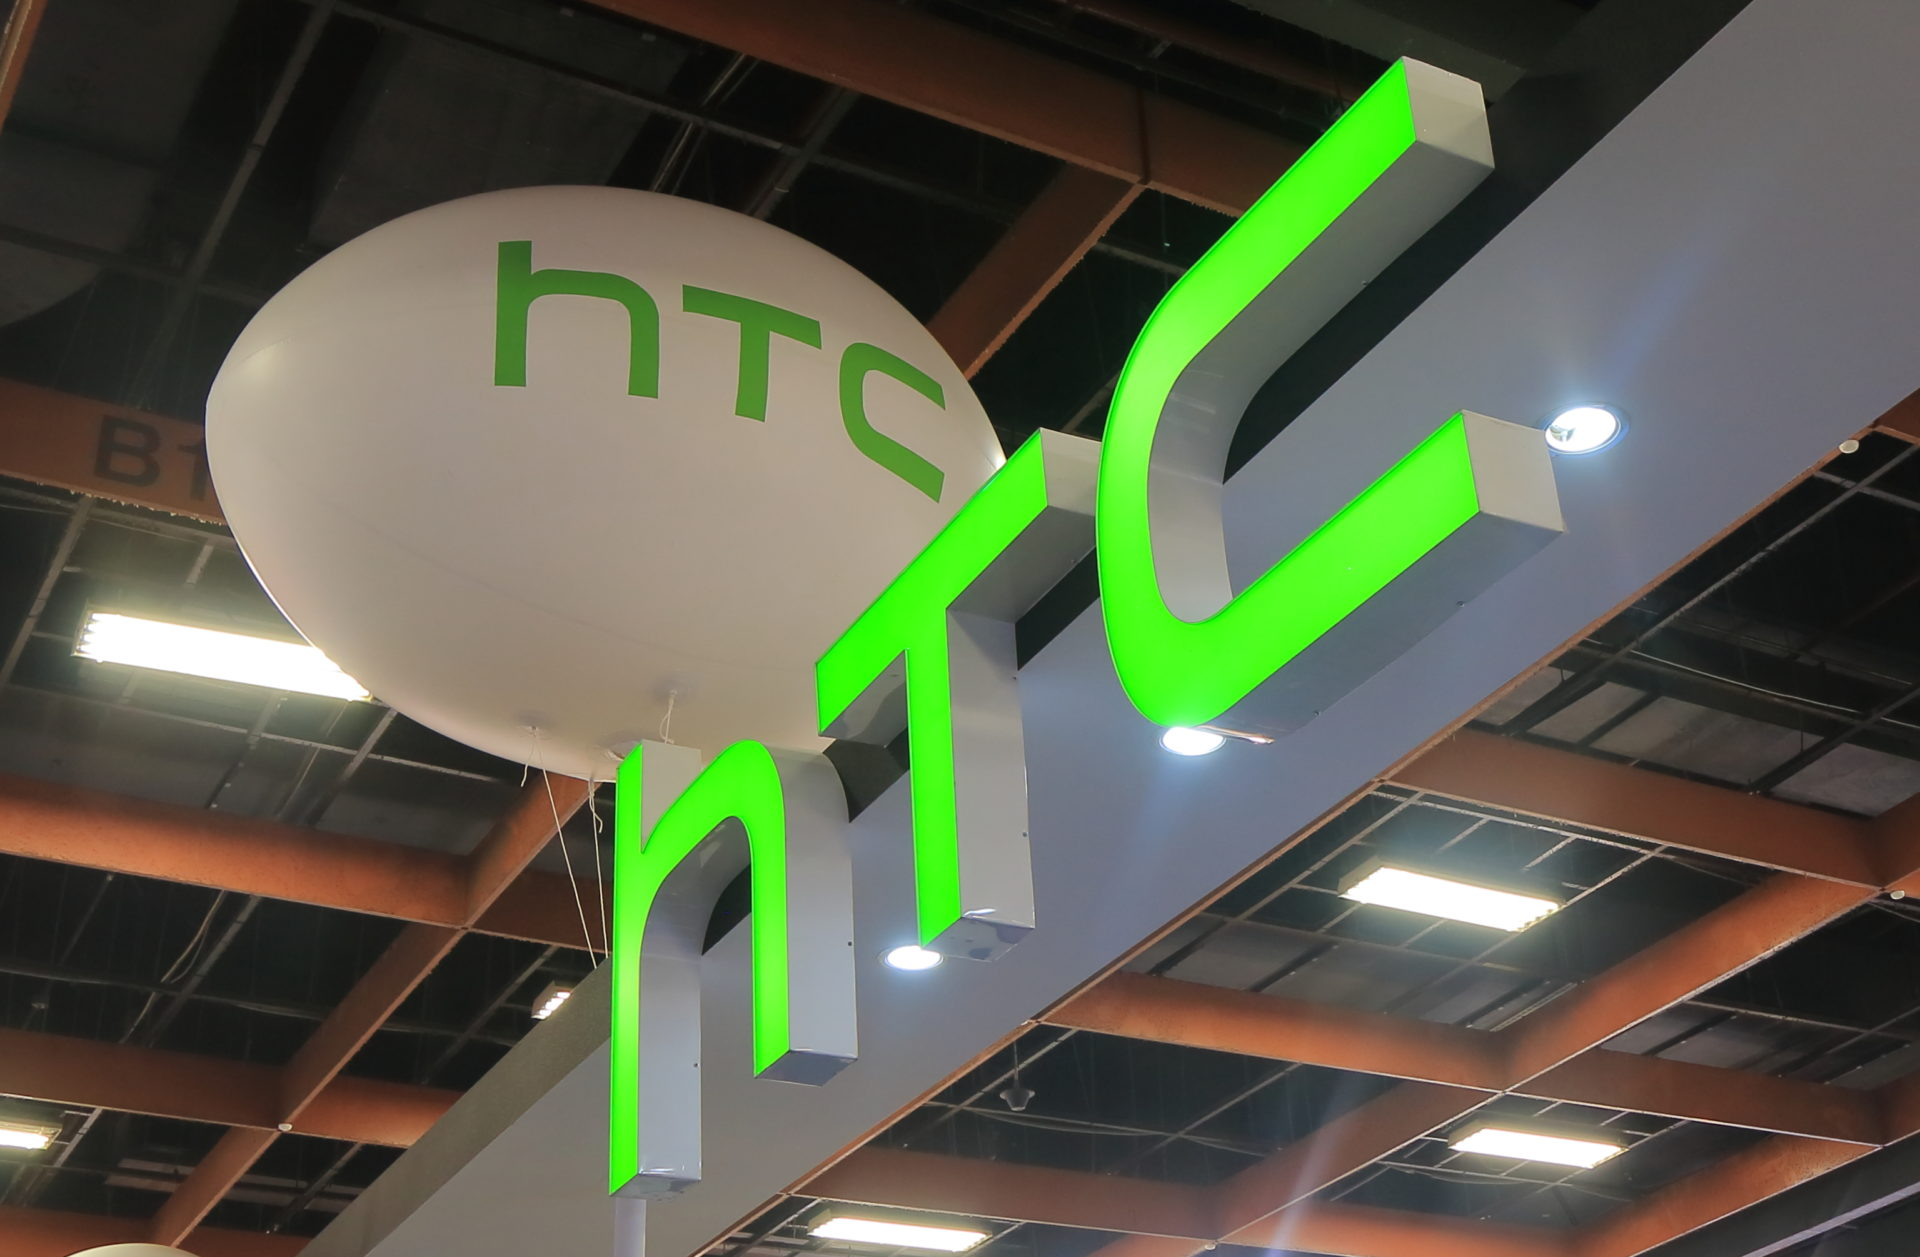 HTC bitcoin wallet cum smartphone